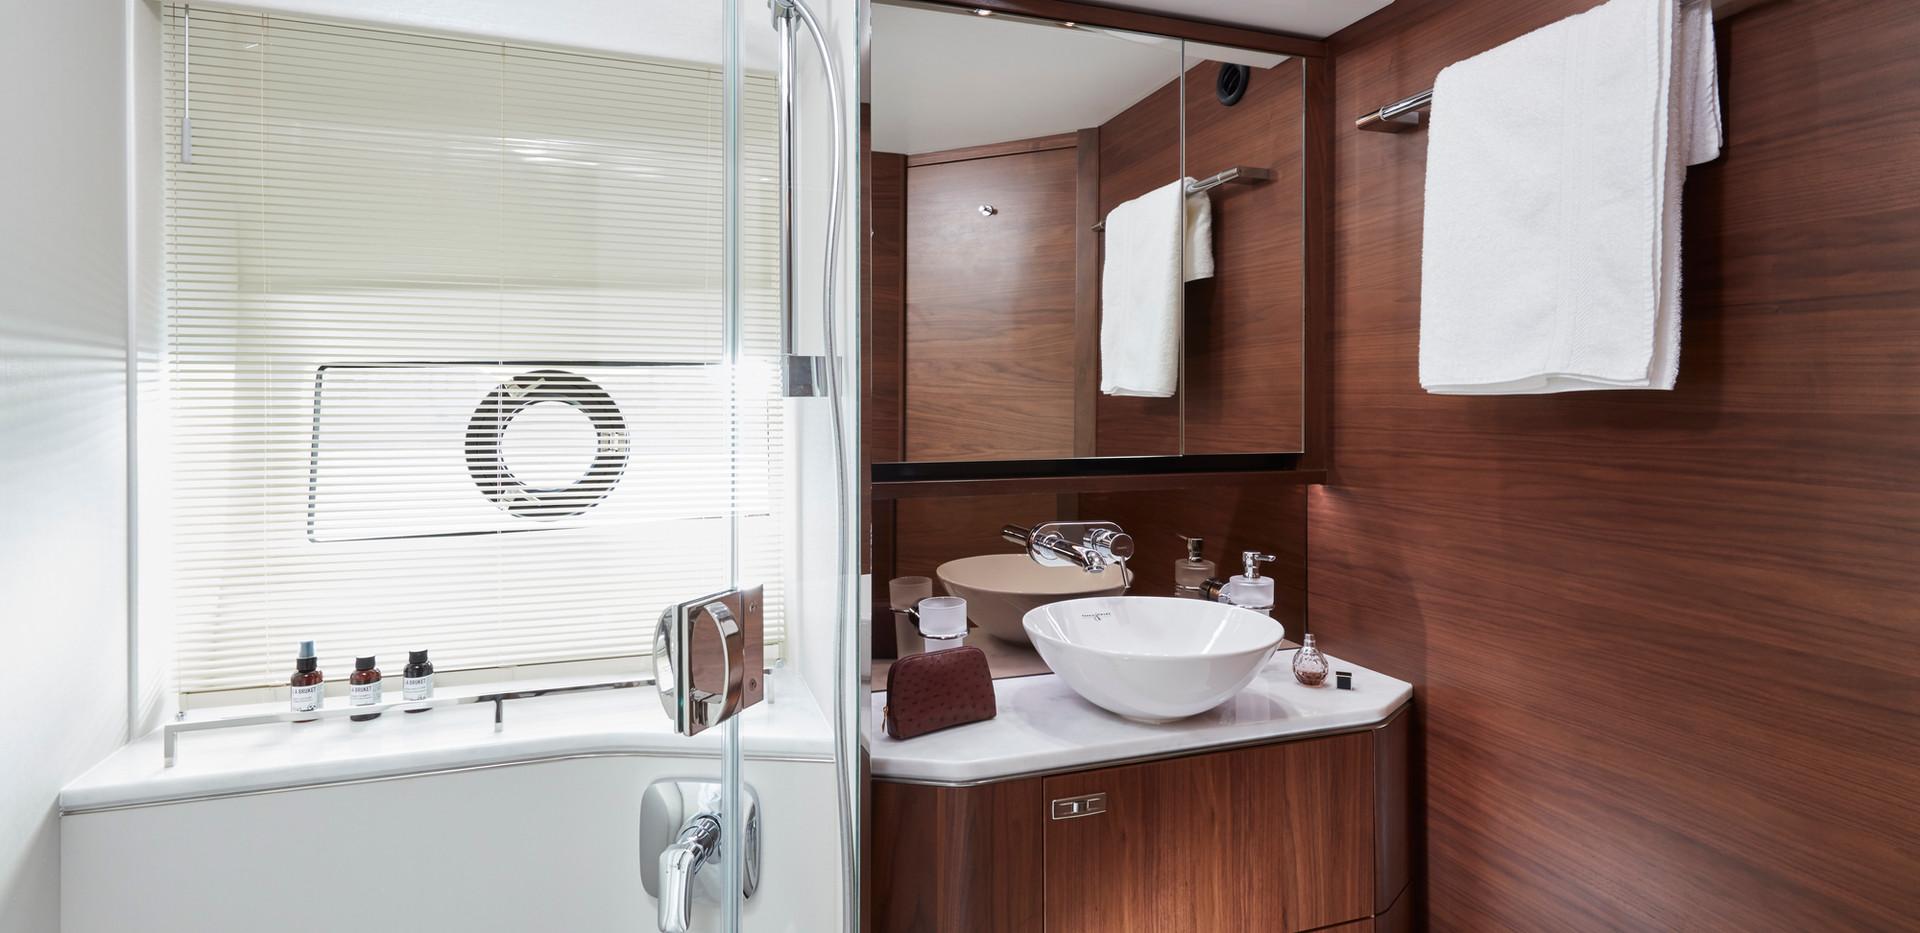 62-interior-forward-bathroom-american-wa